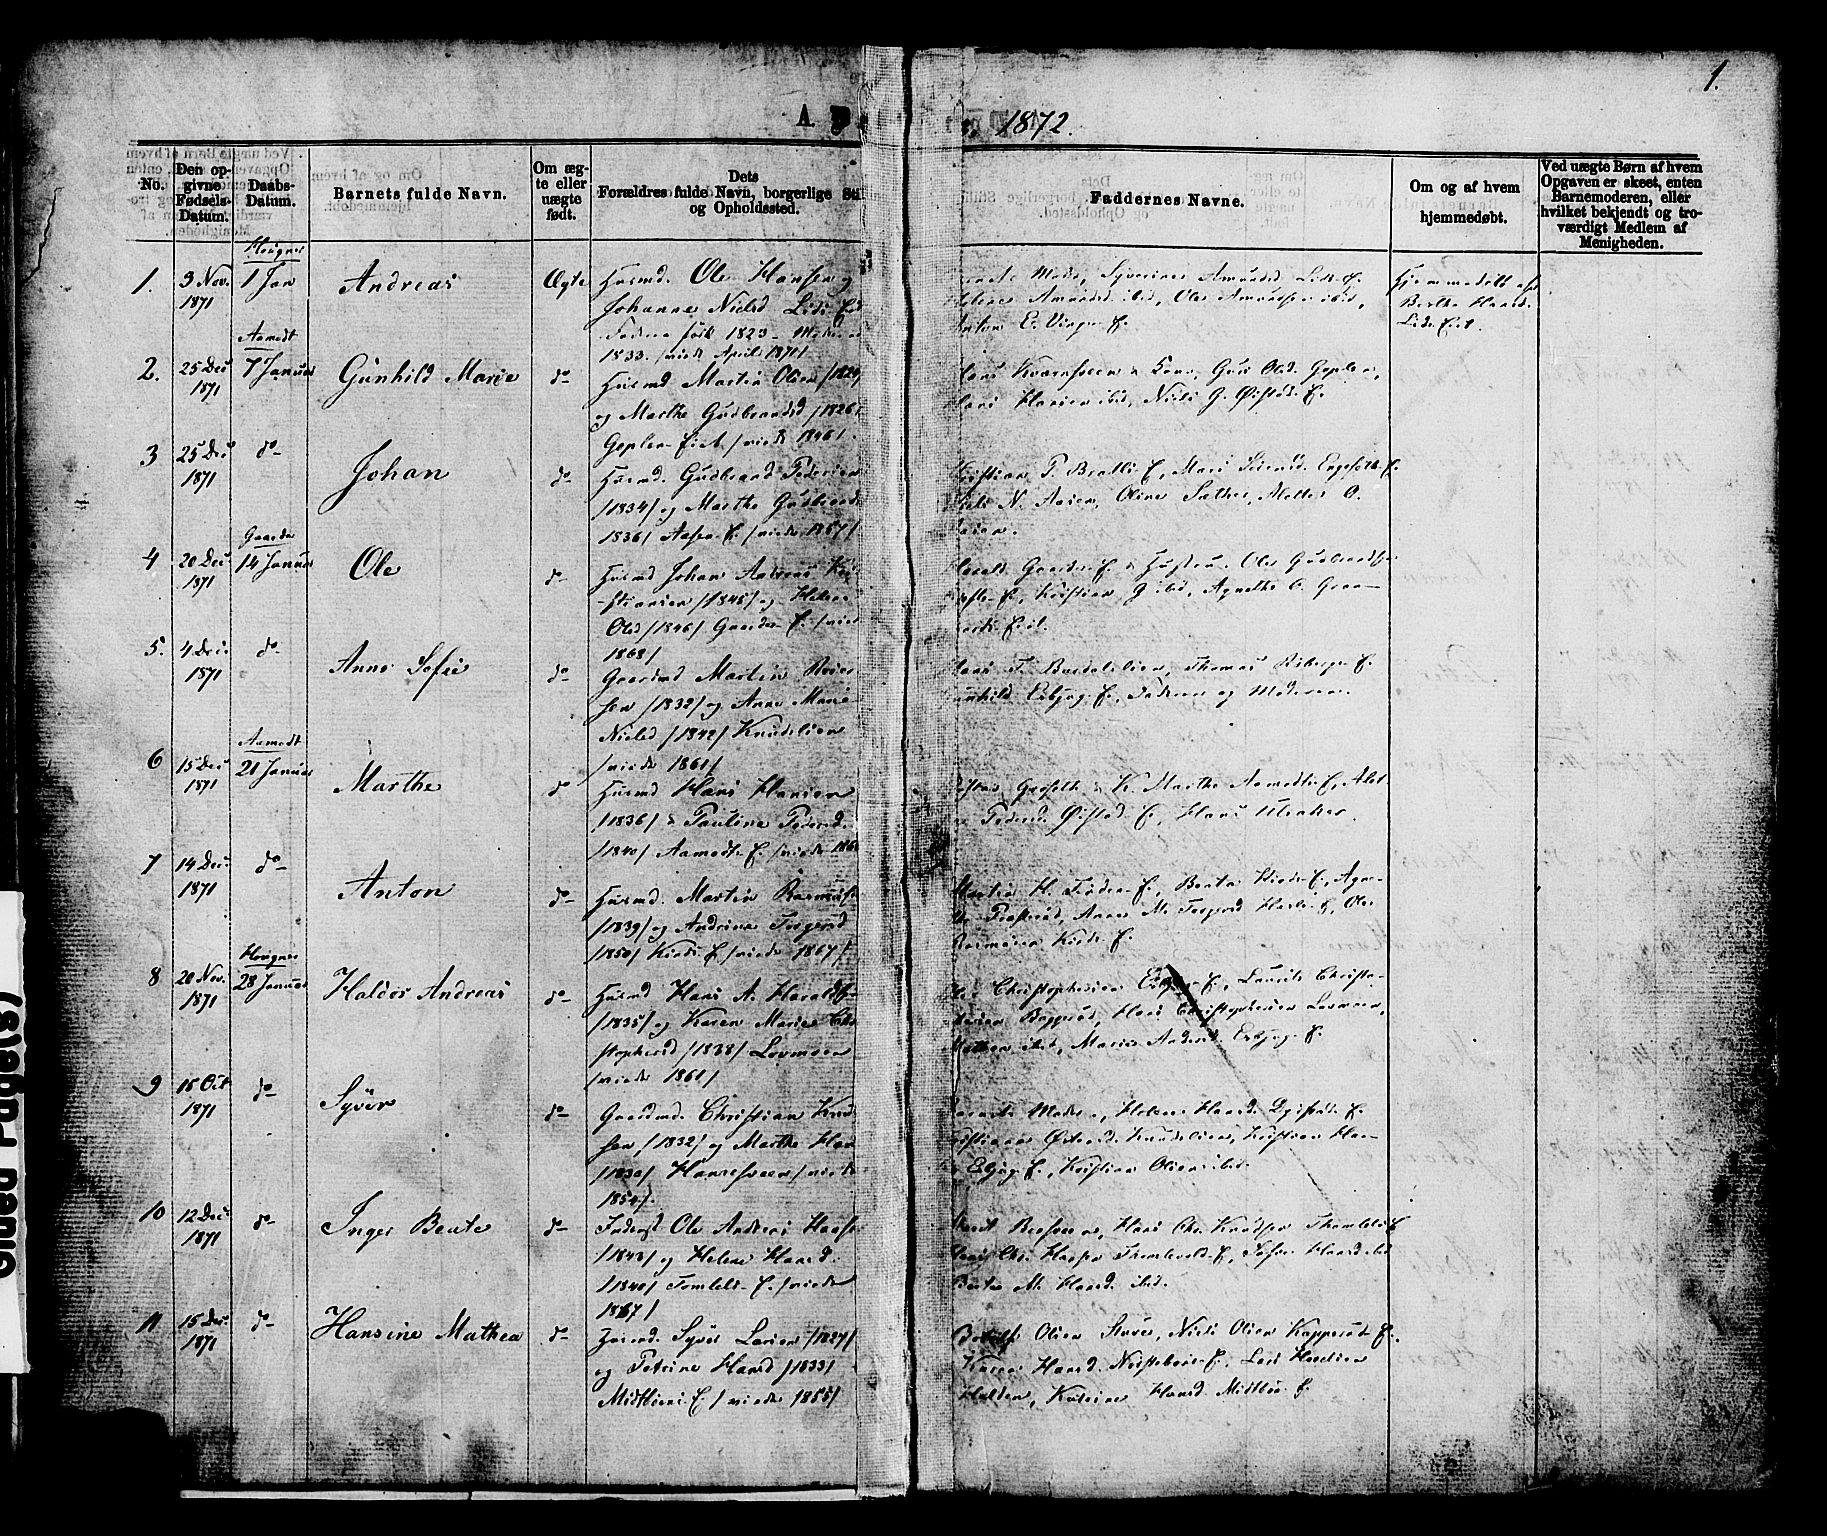 SAH, Nordre Land prestekontor, Ministerialbok nr. 2, 1872-1881, s. 1